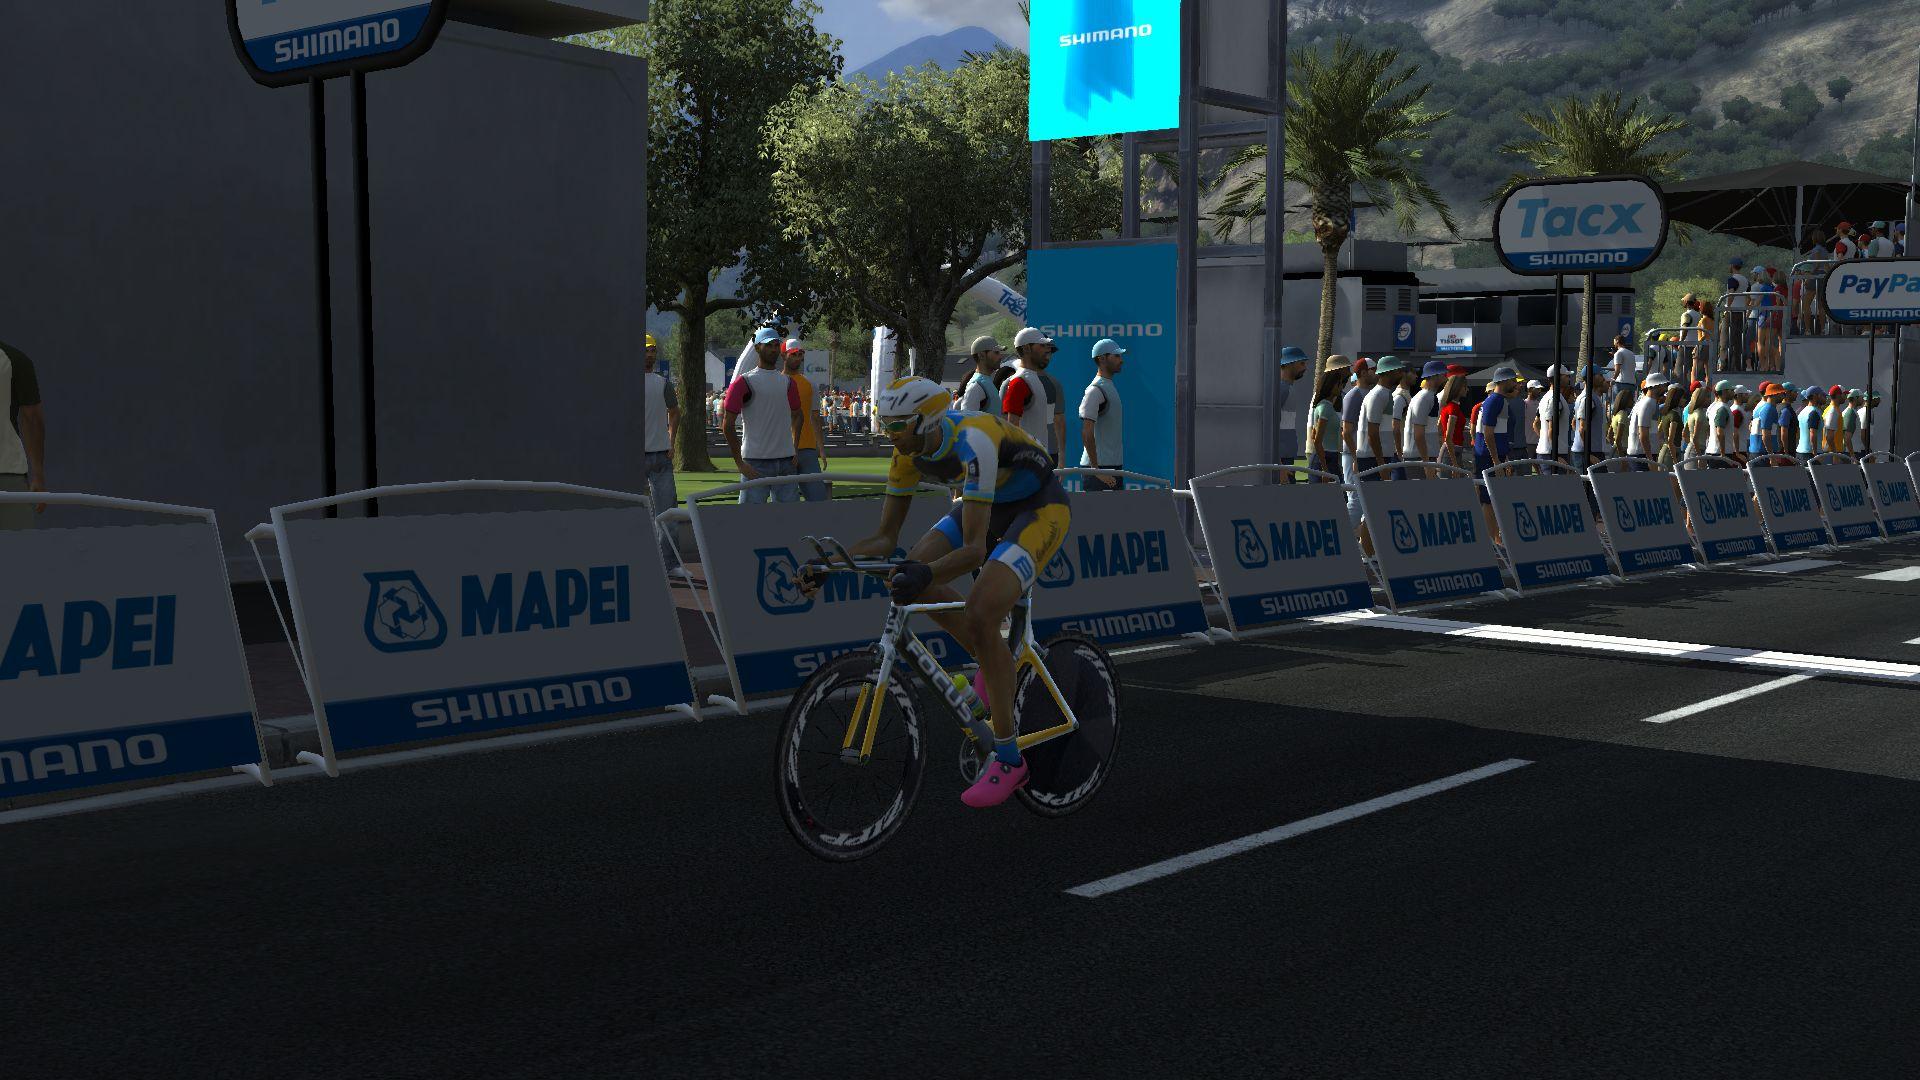 pcmdaily.com/images/mg/2017/Races/CT/Trentino/mg2017_trentino_01_PCM0014.jpg